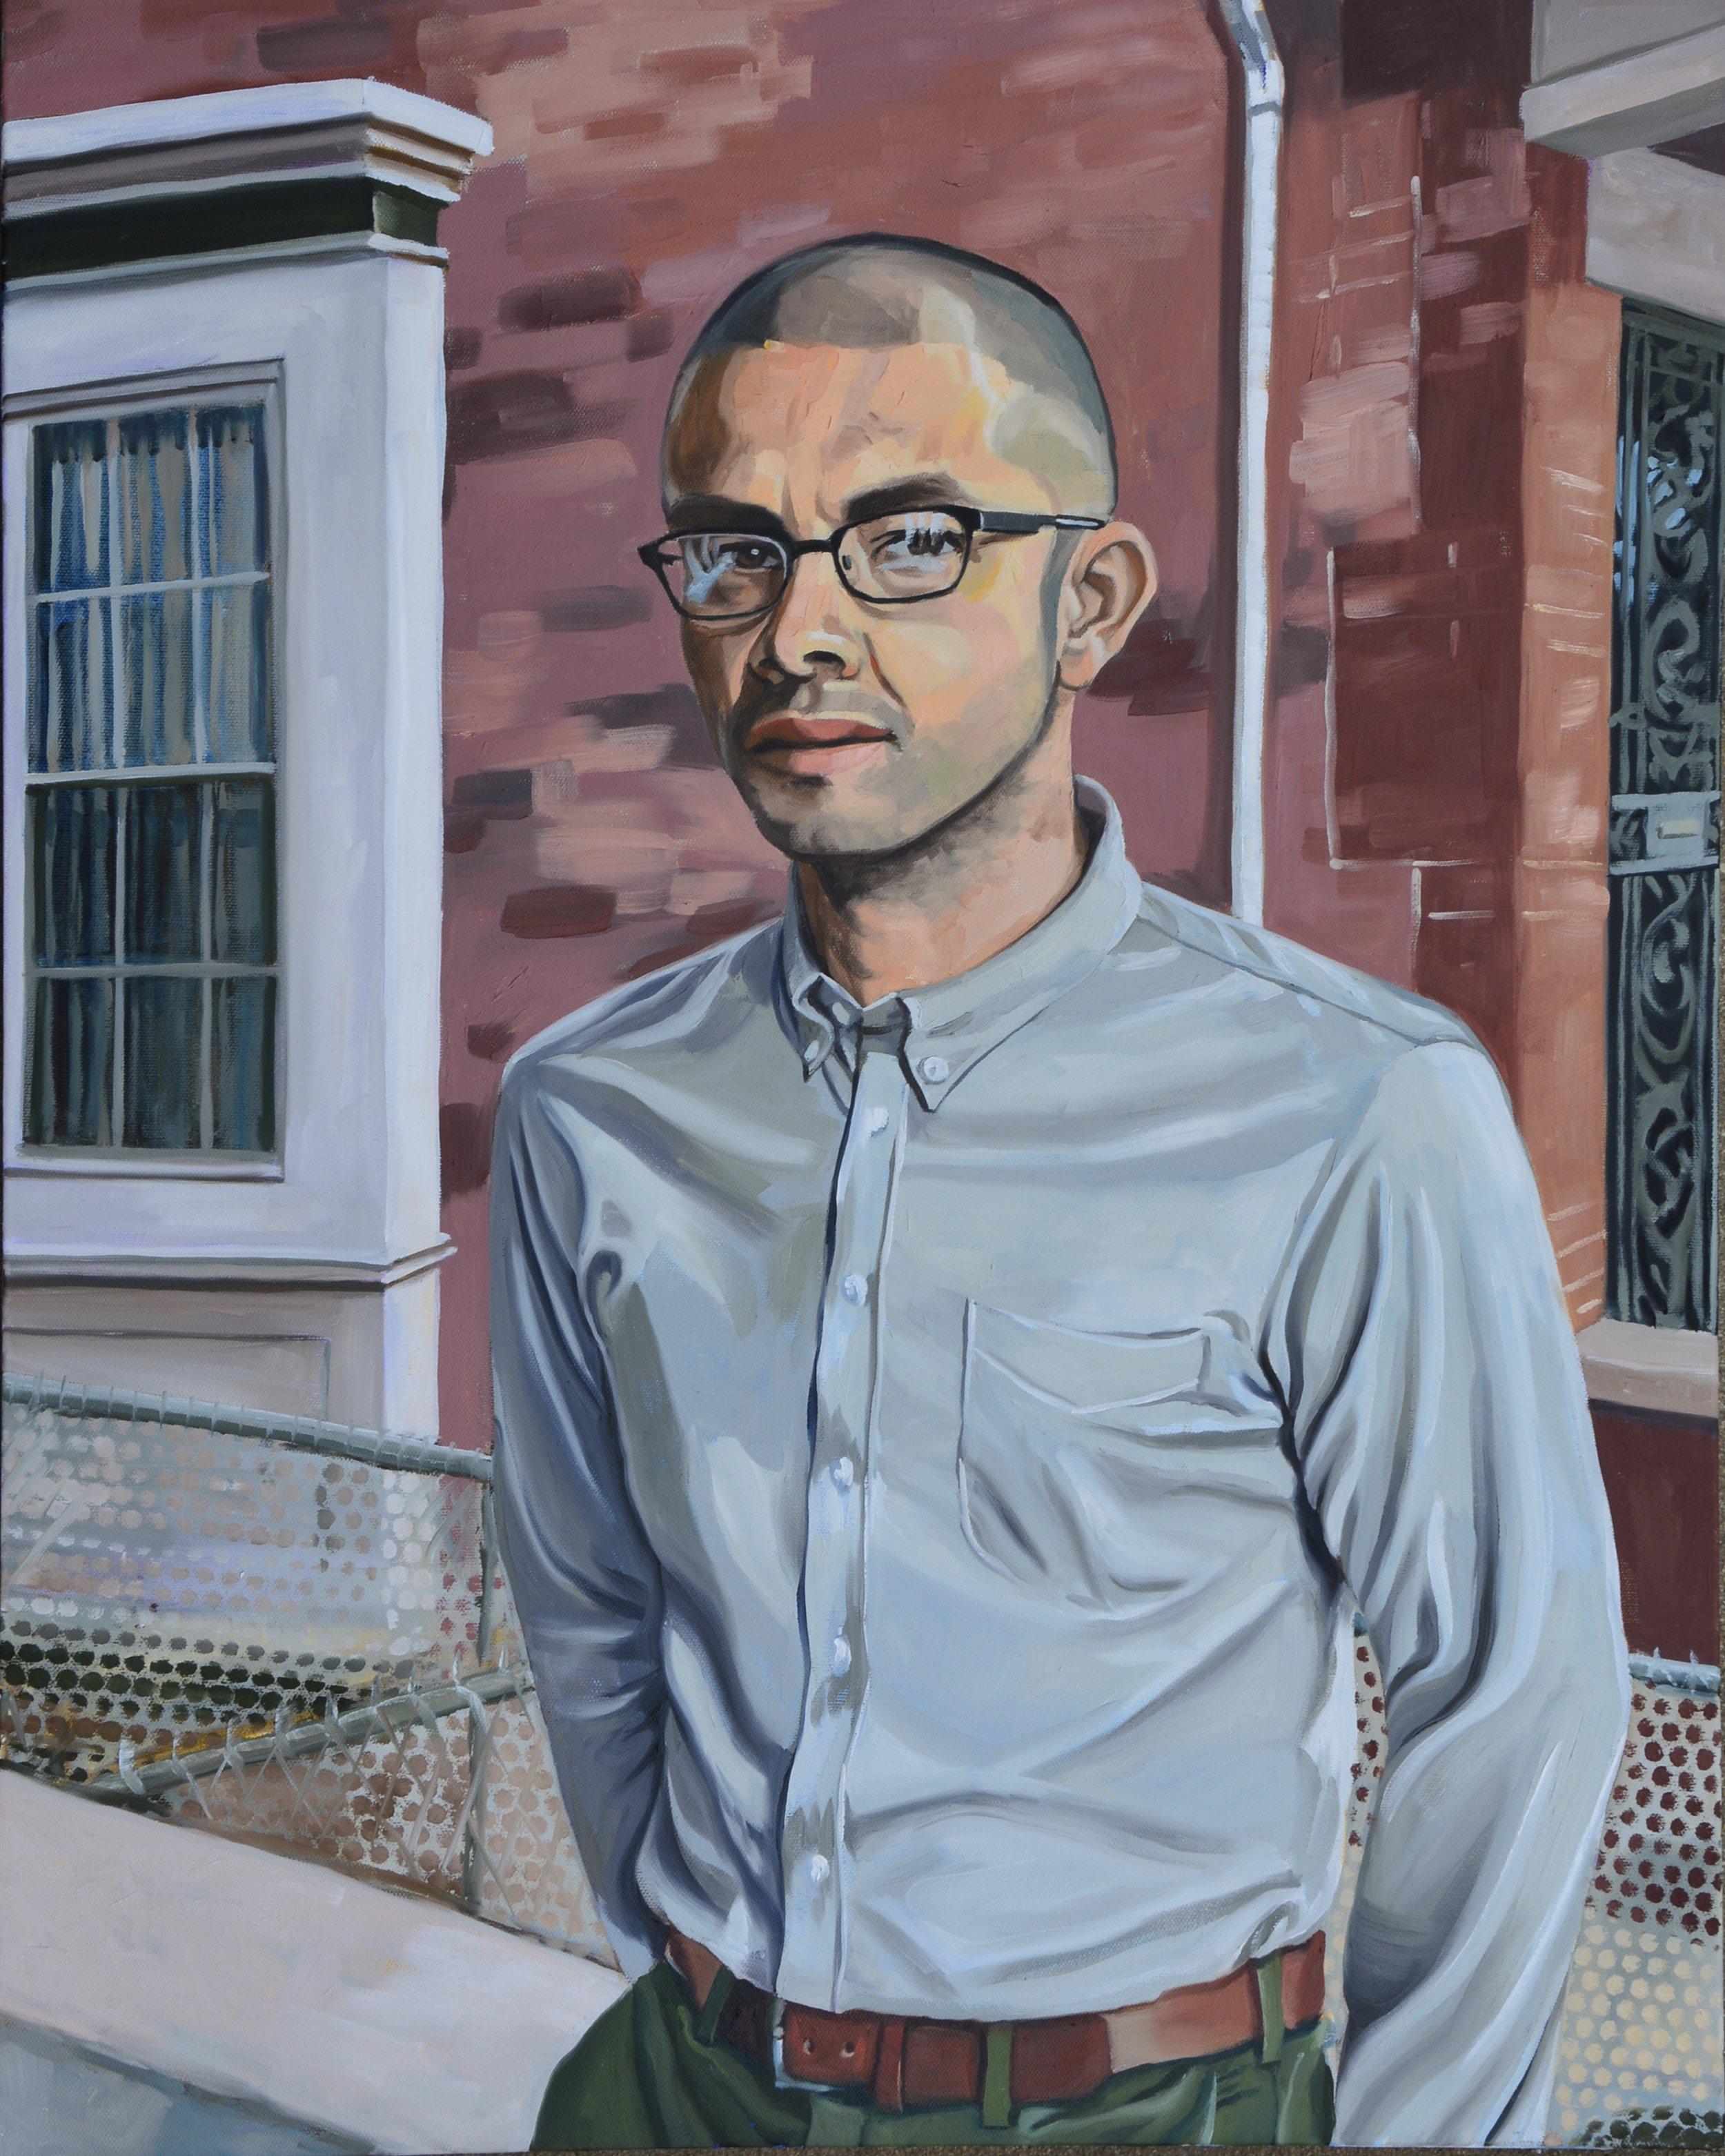 "Copy of Good Neighbors (Roberto), 24x30"", oil on canvas, 2017"